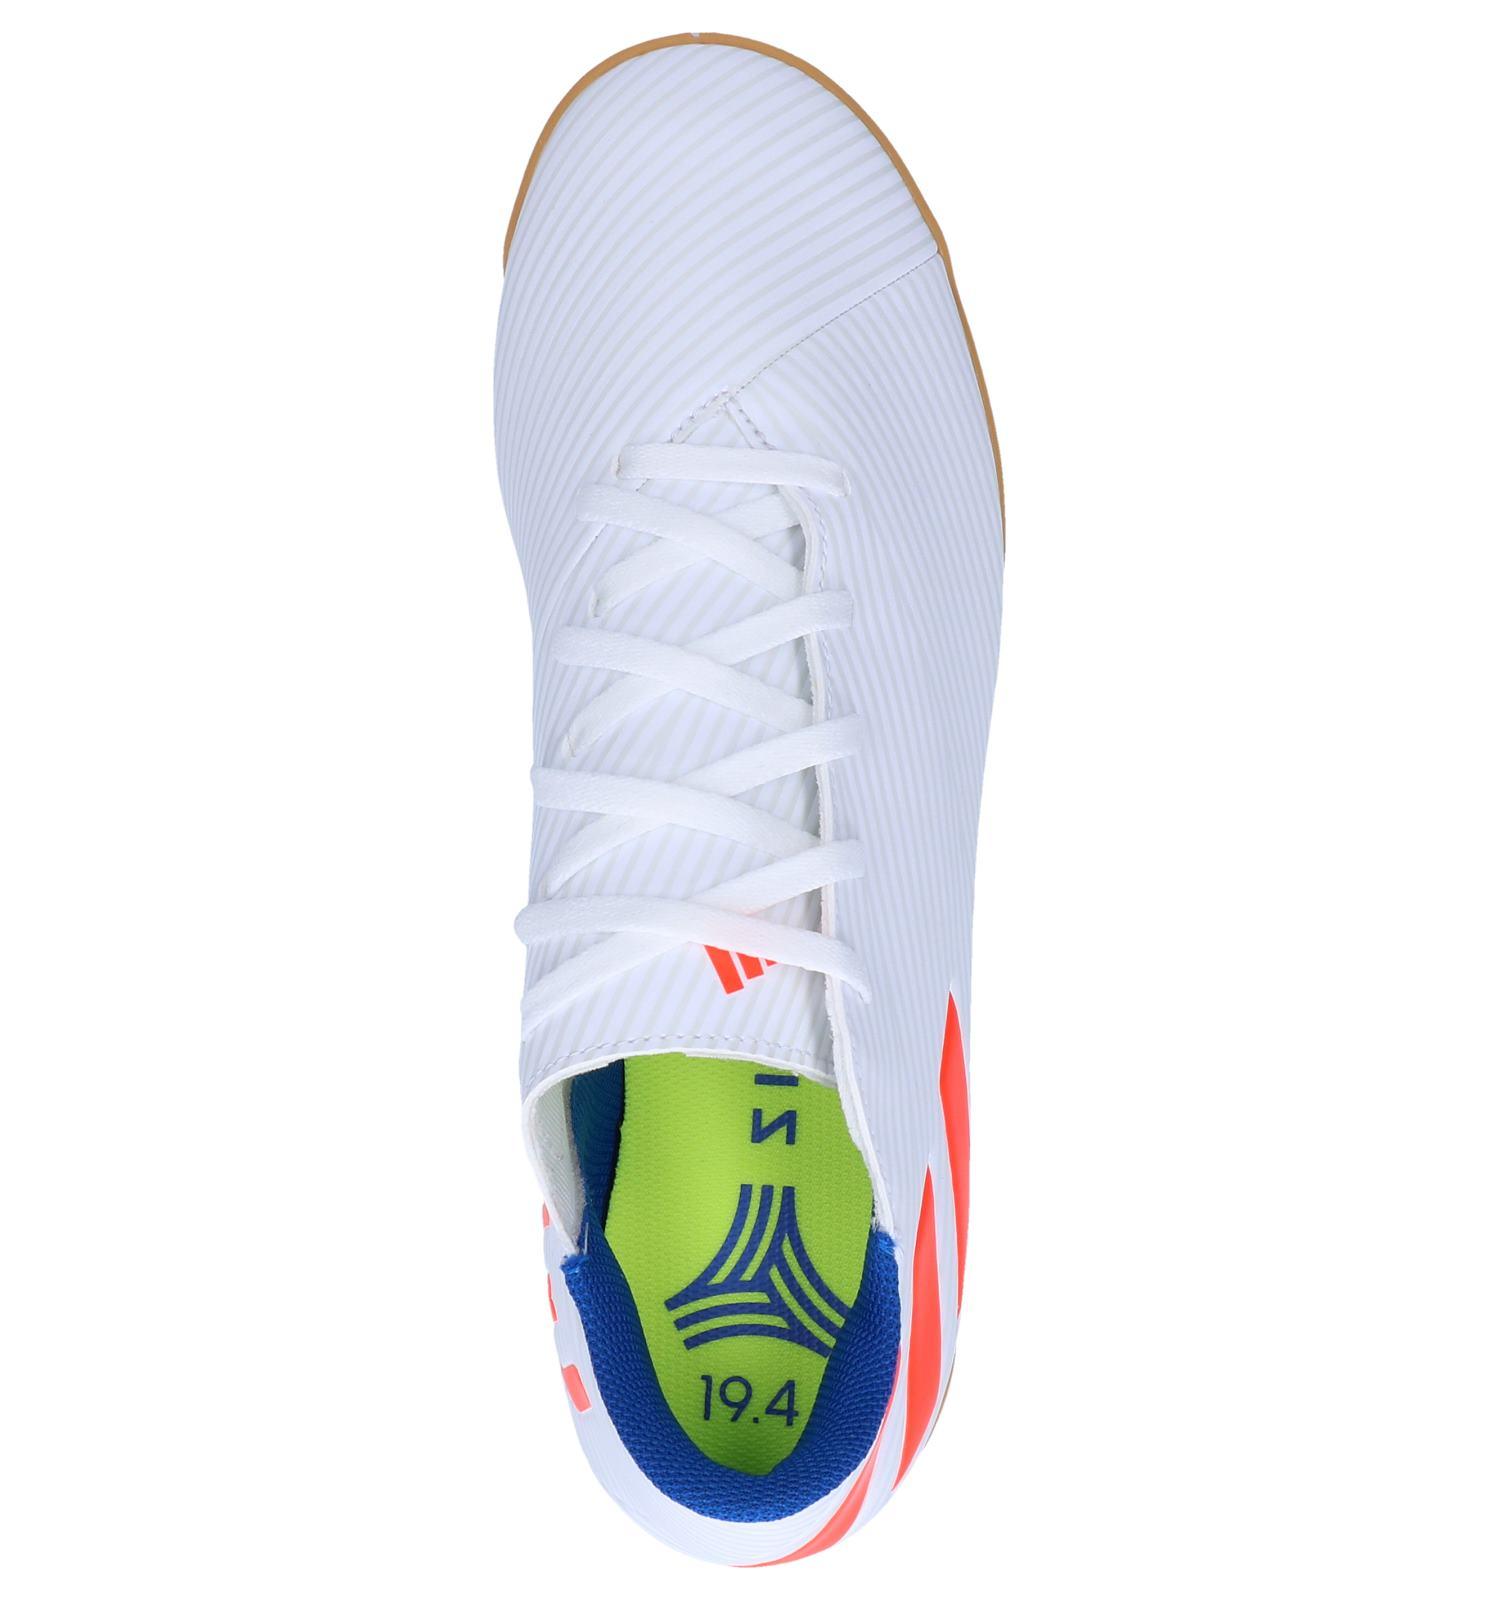 Witte Zaalvoetbalschoenen adidas Nemeziz Messi | TORFS.BE ...